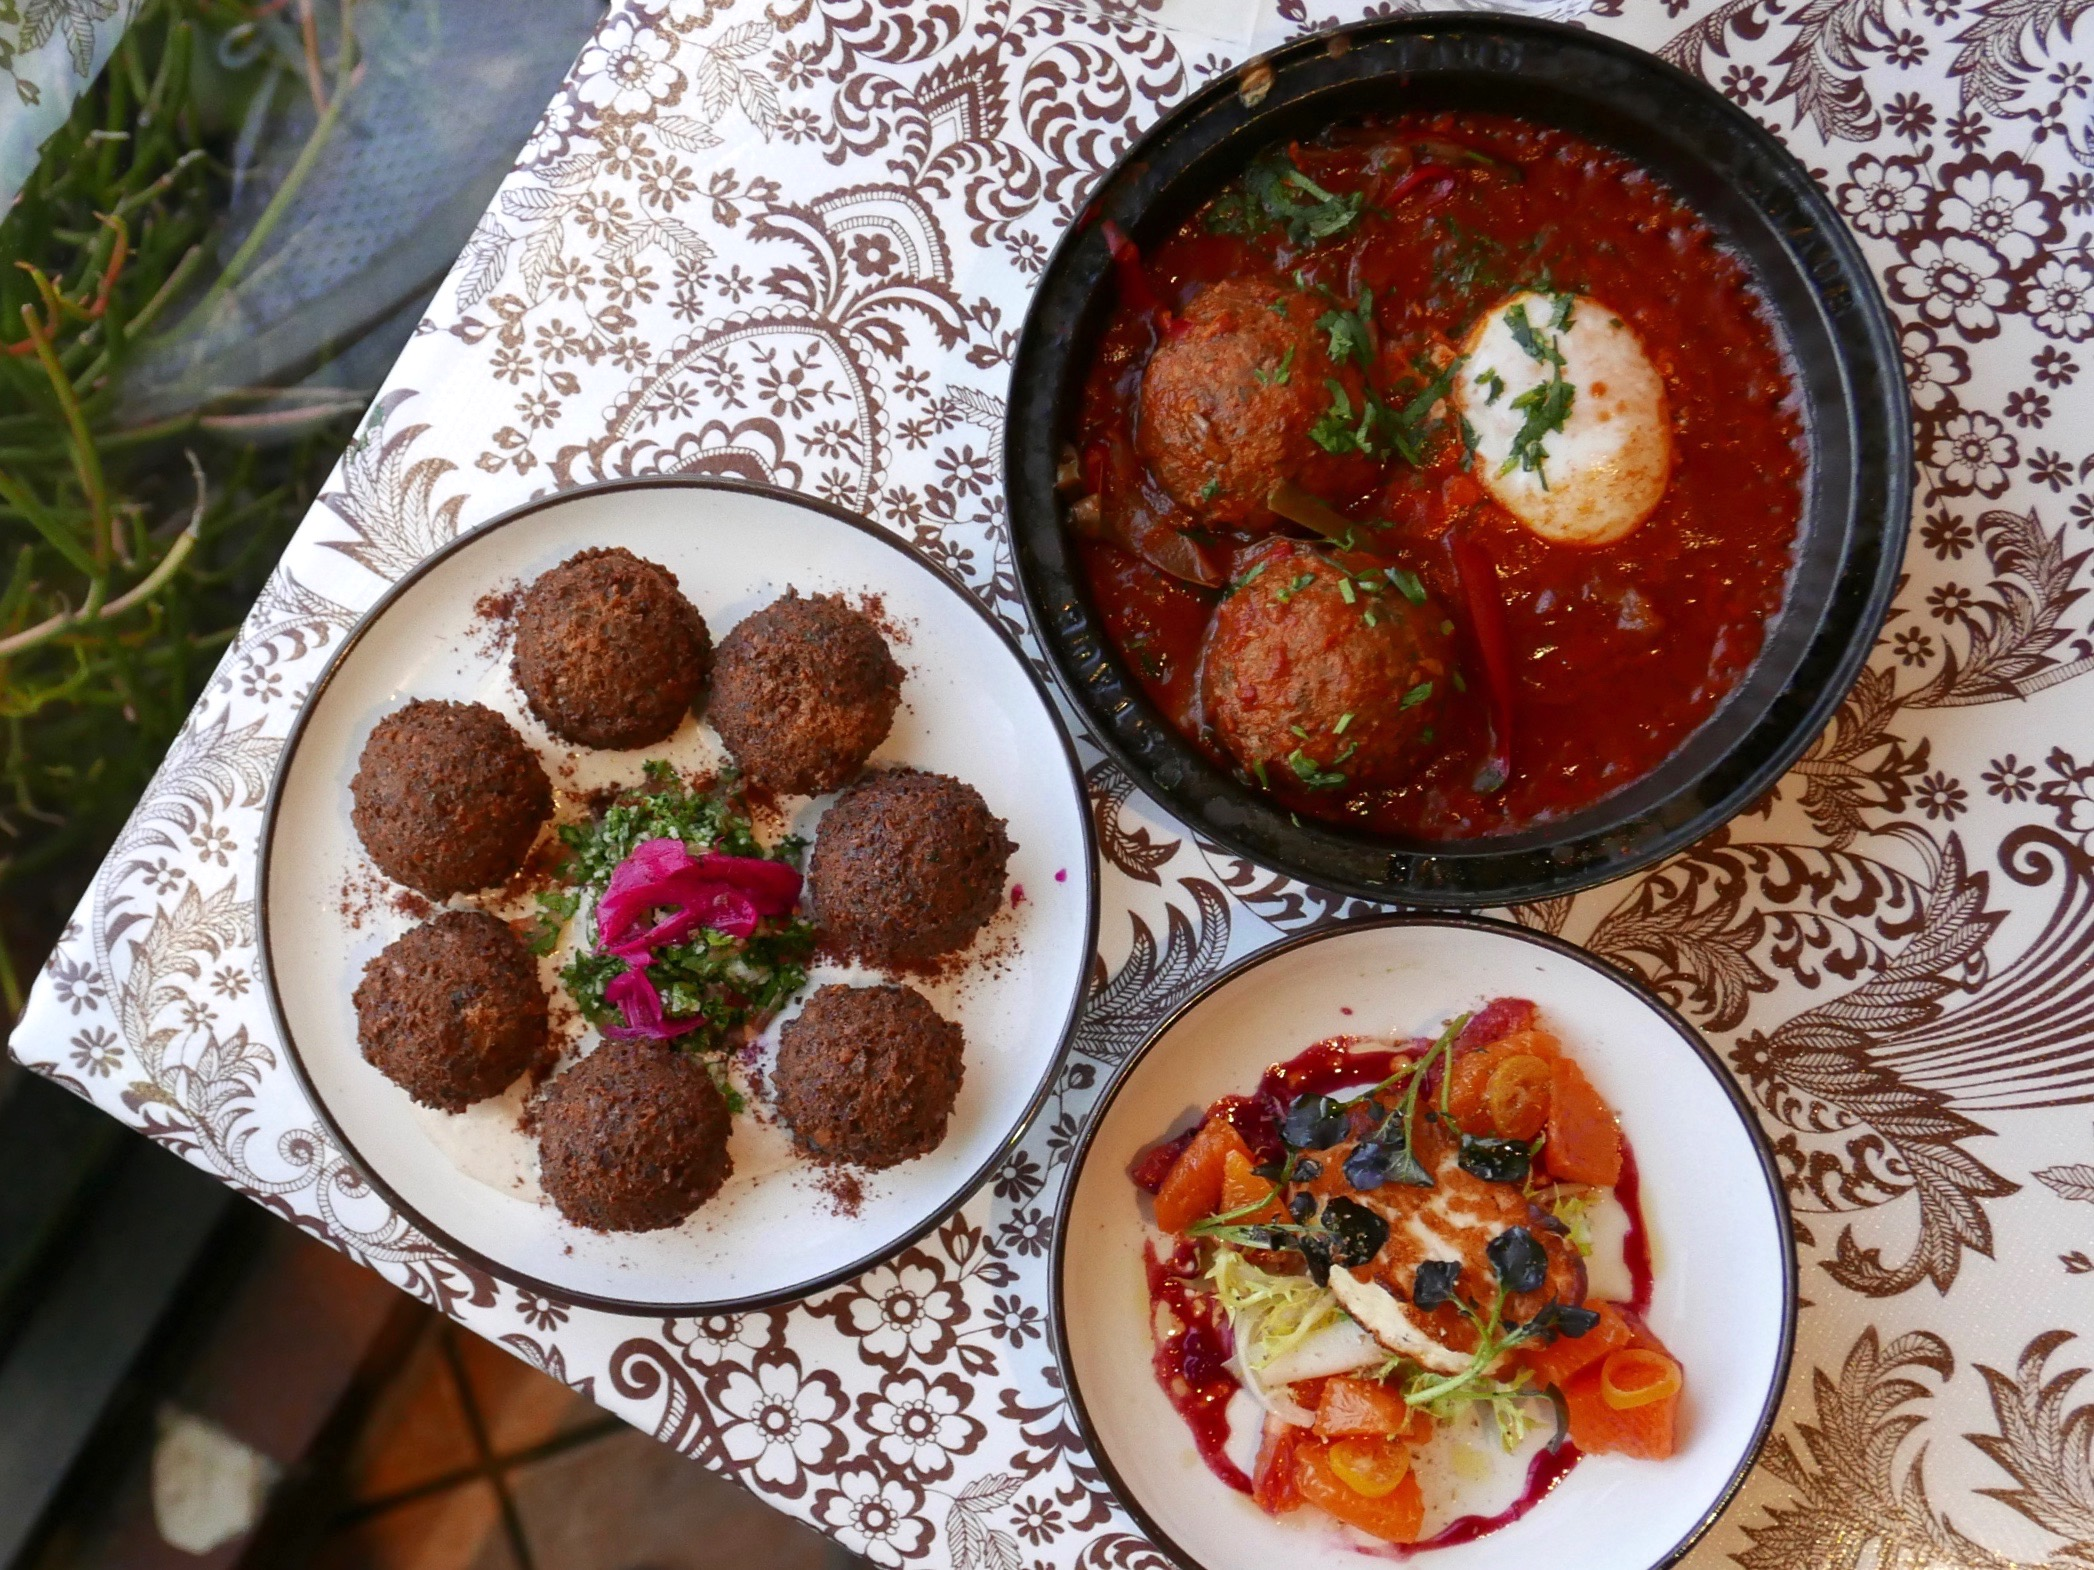 An Essential LA Israeli Restaurant Opens Second Location in West Adams